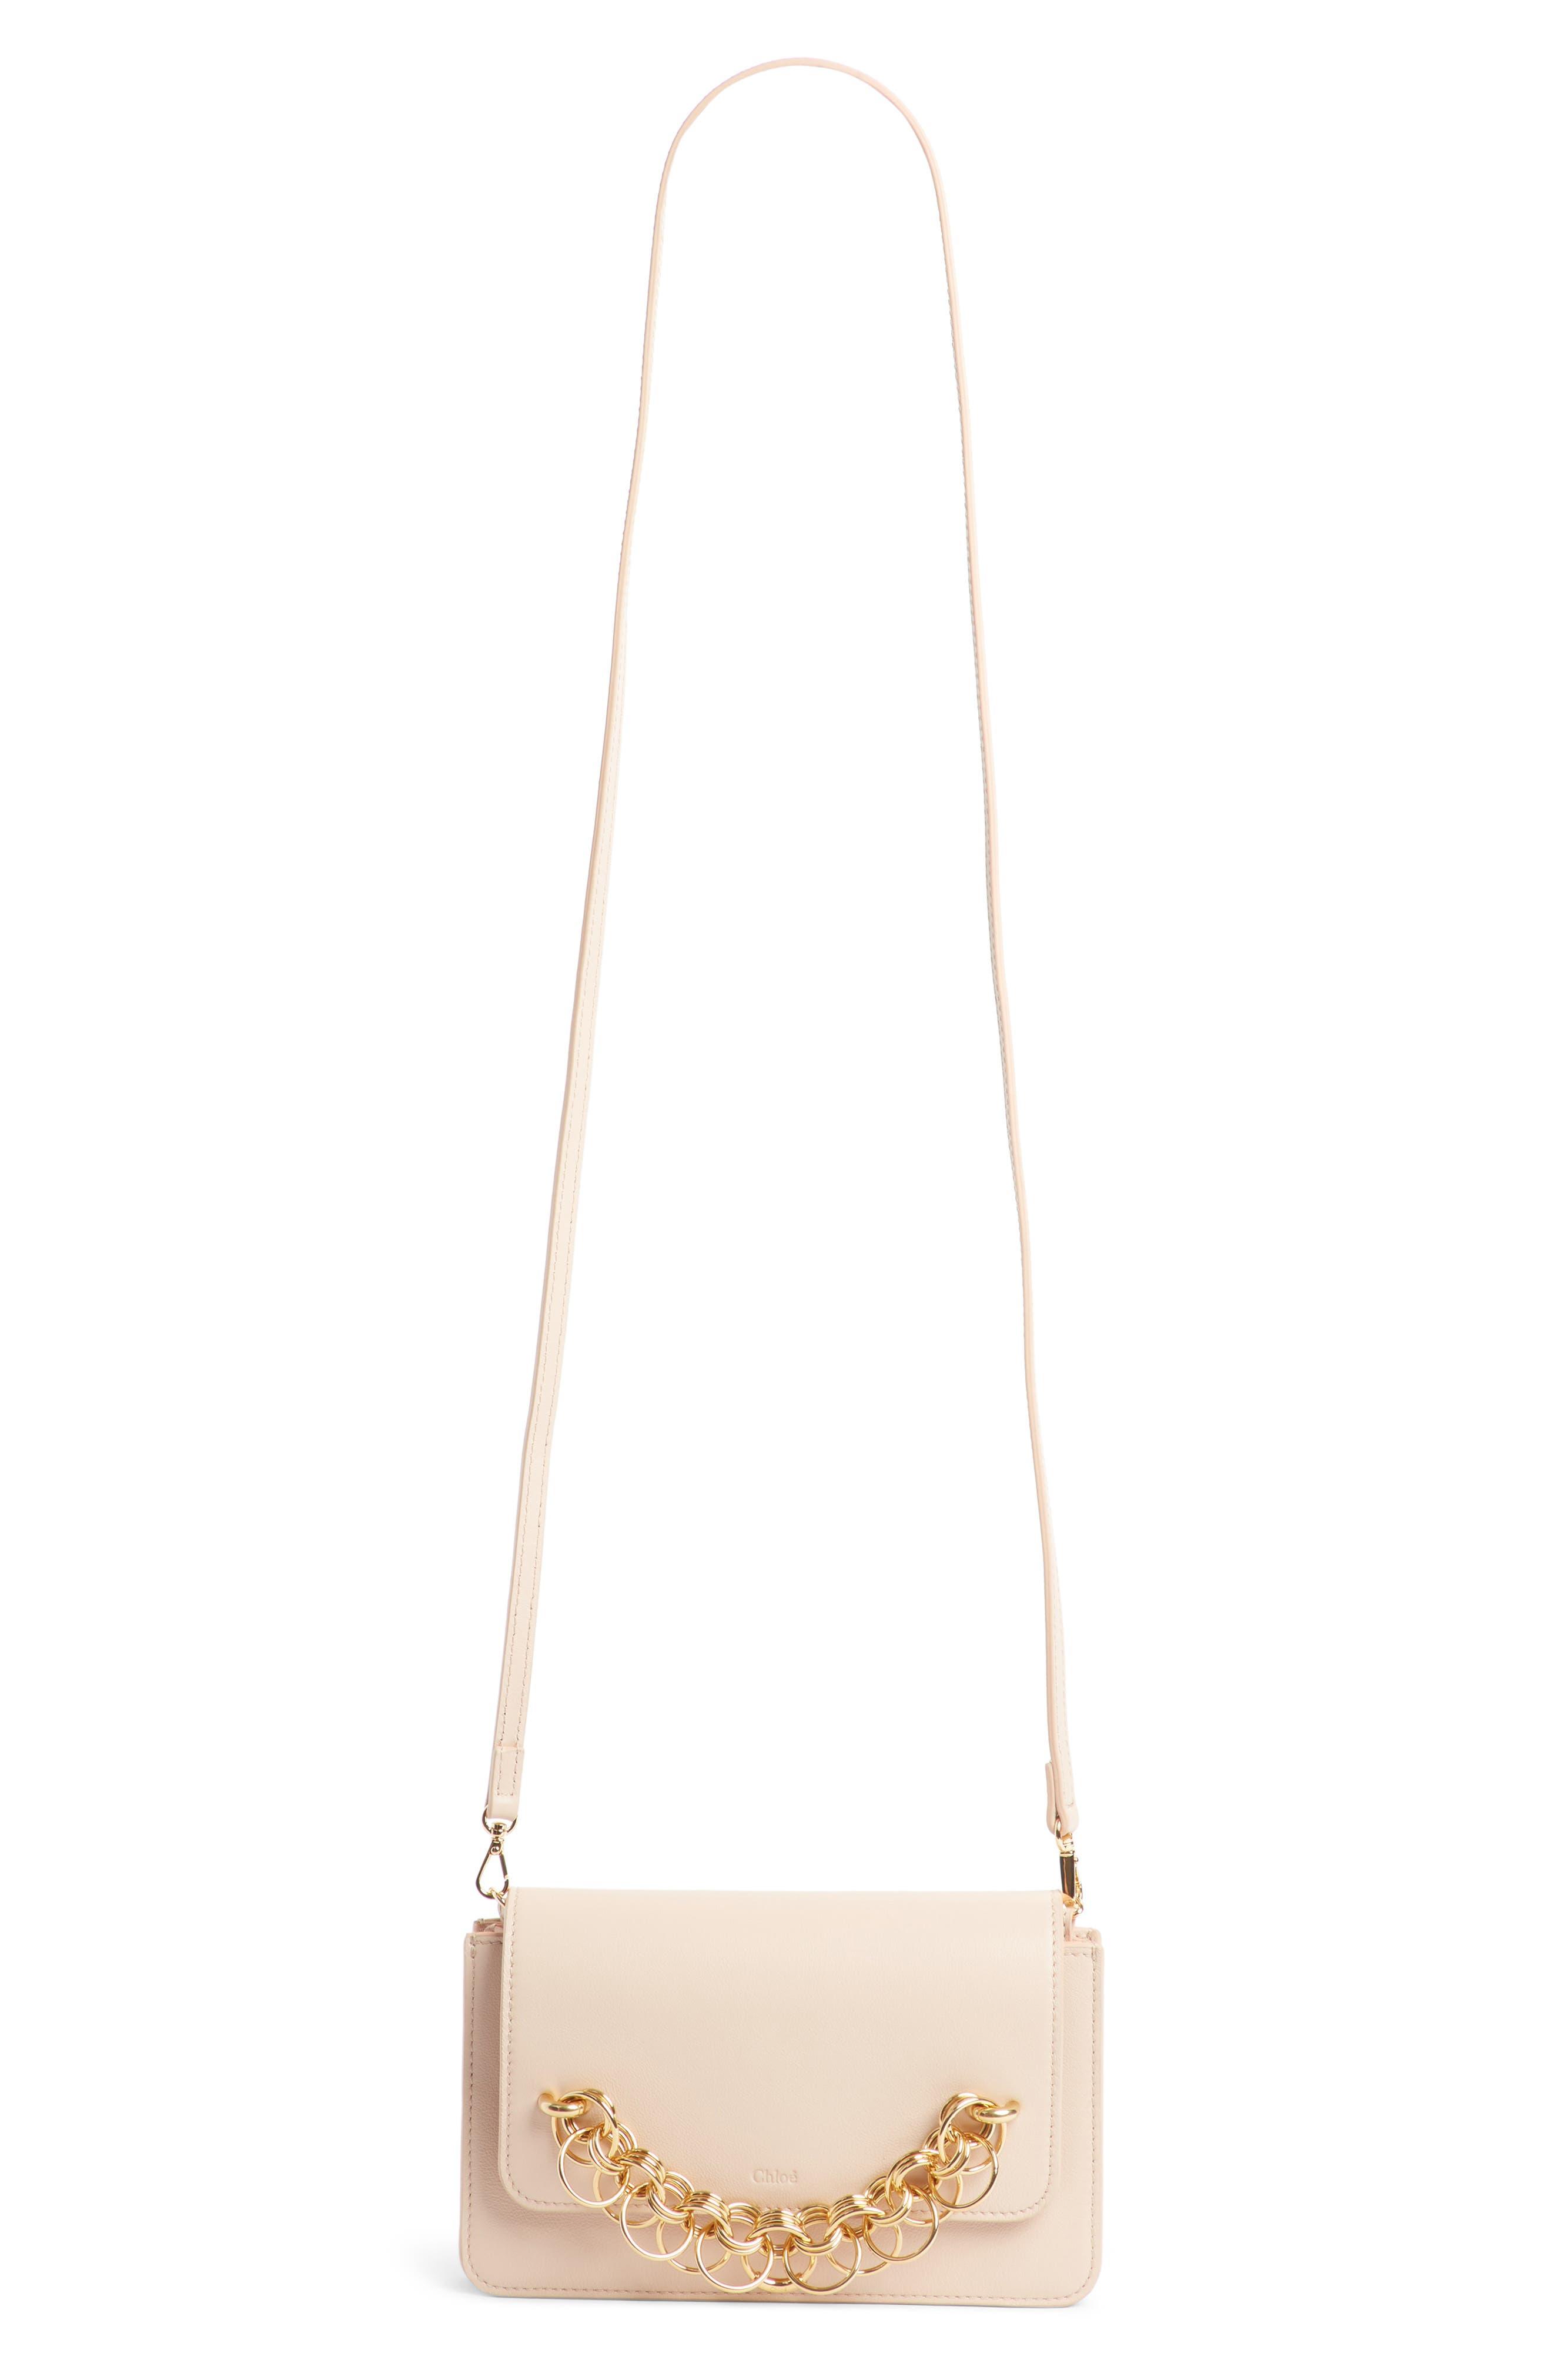 Drew Bijoux Leather Crossbody Bag,                         Main,                         color, CEMENT PINK